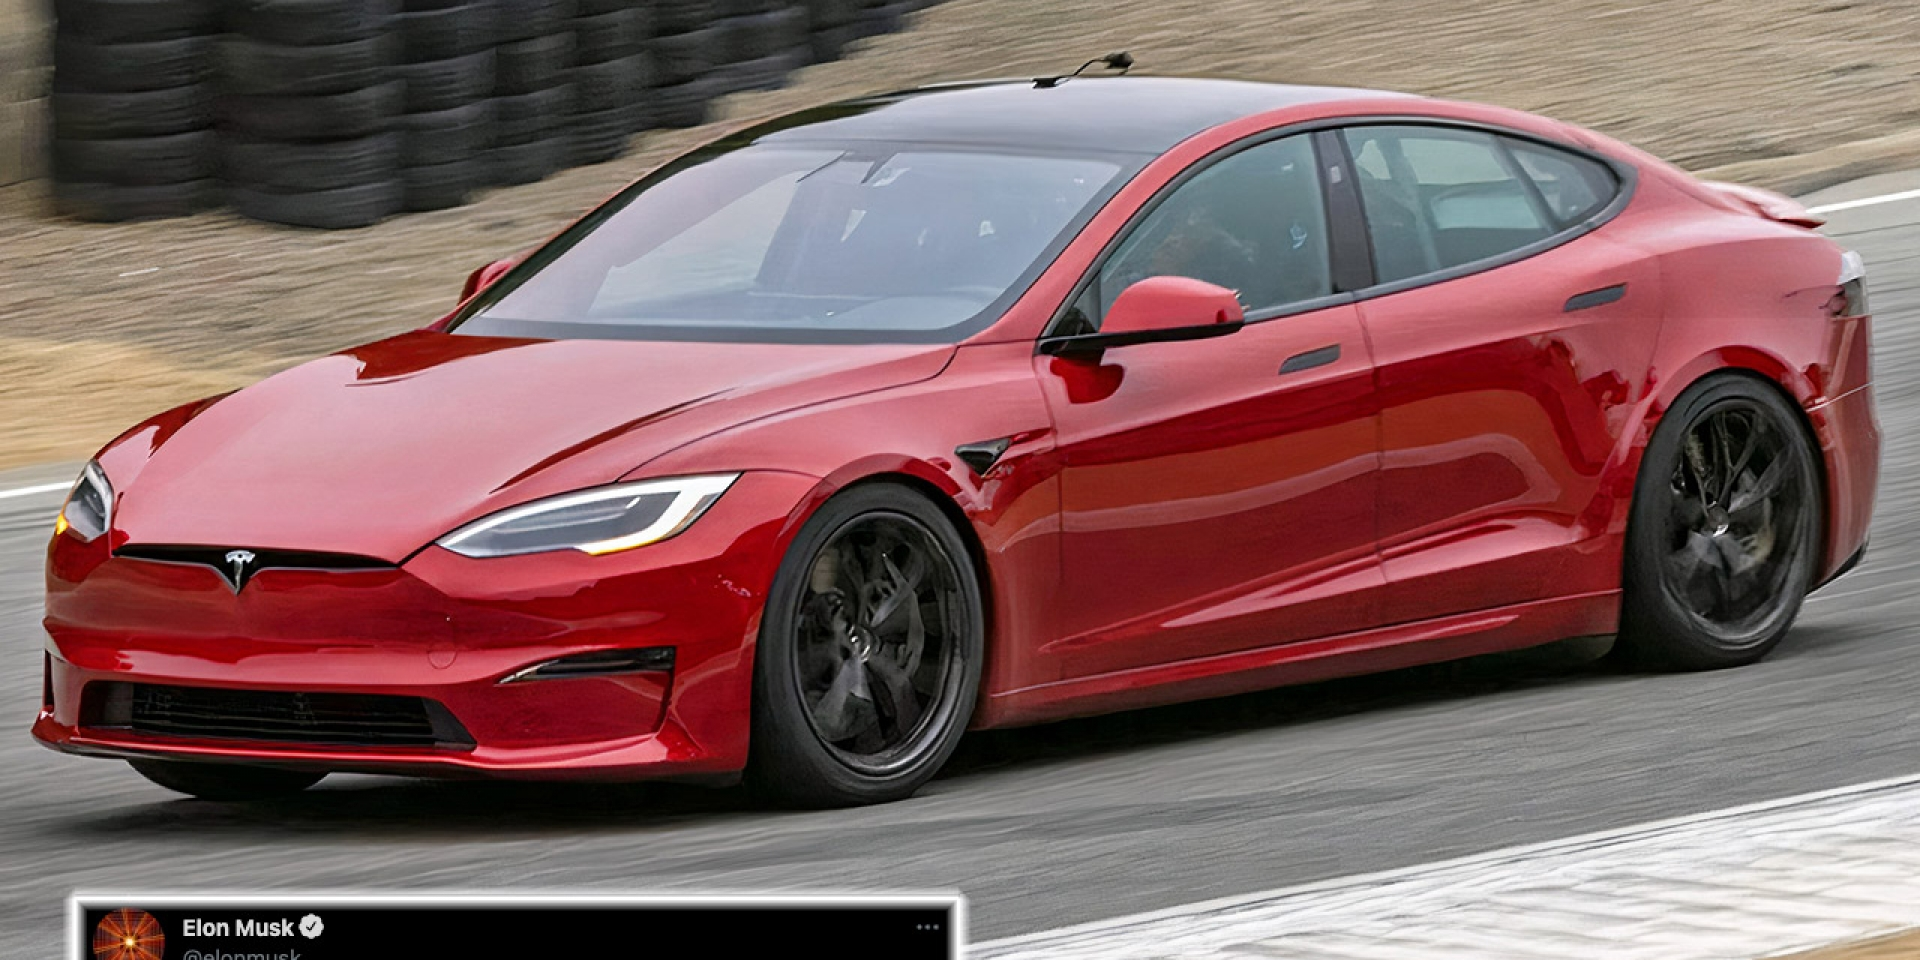 Tesla Model S Plaid加速成績確定!0-400m只需要9.23秒!